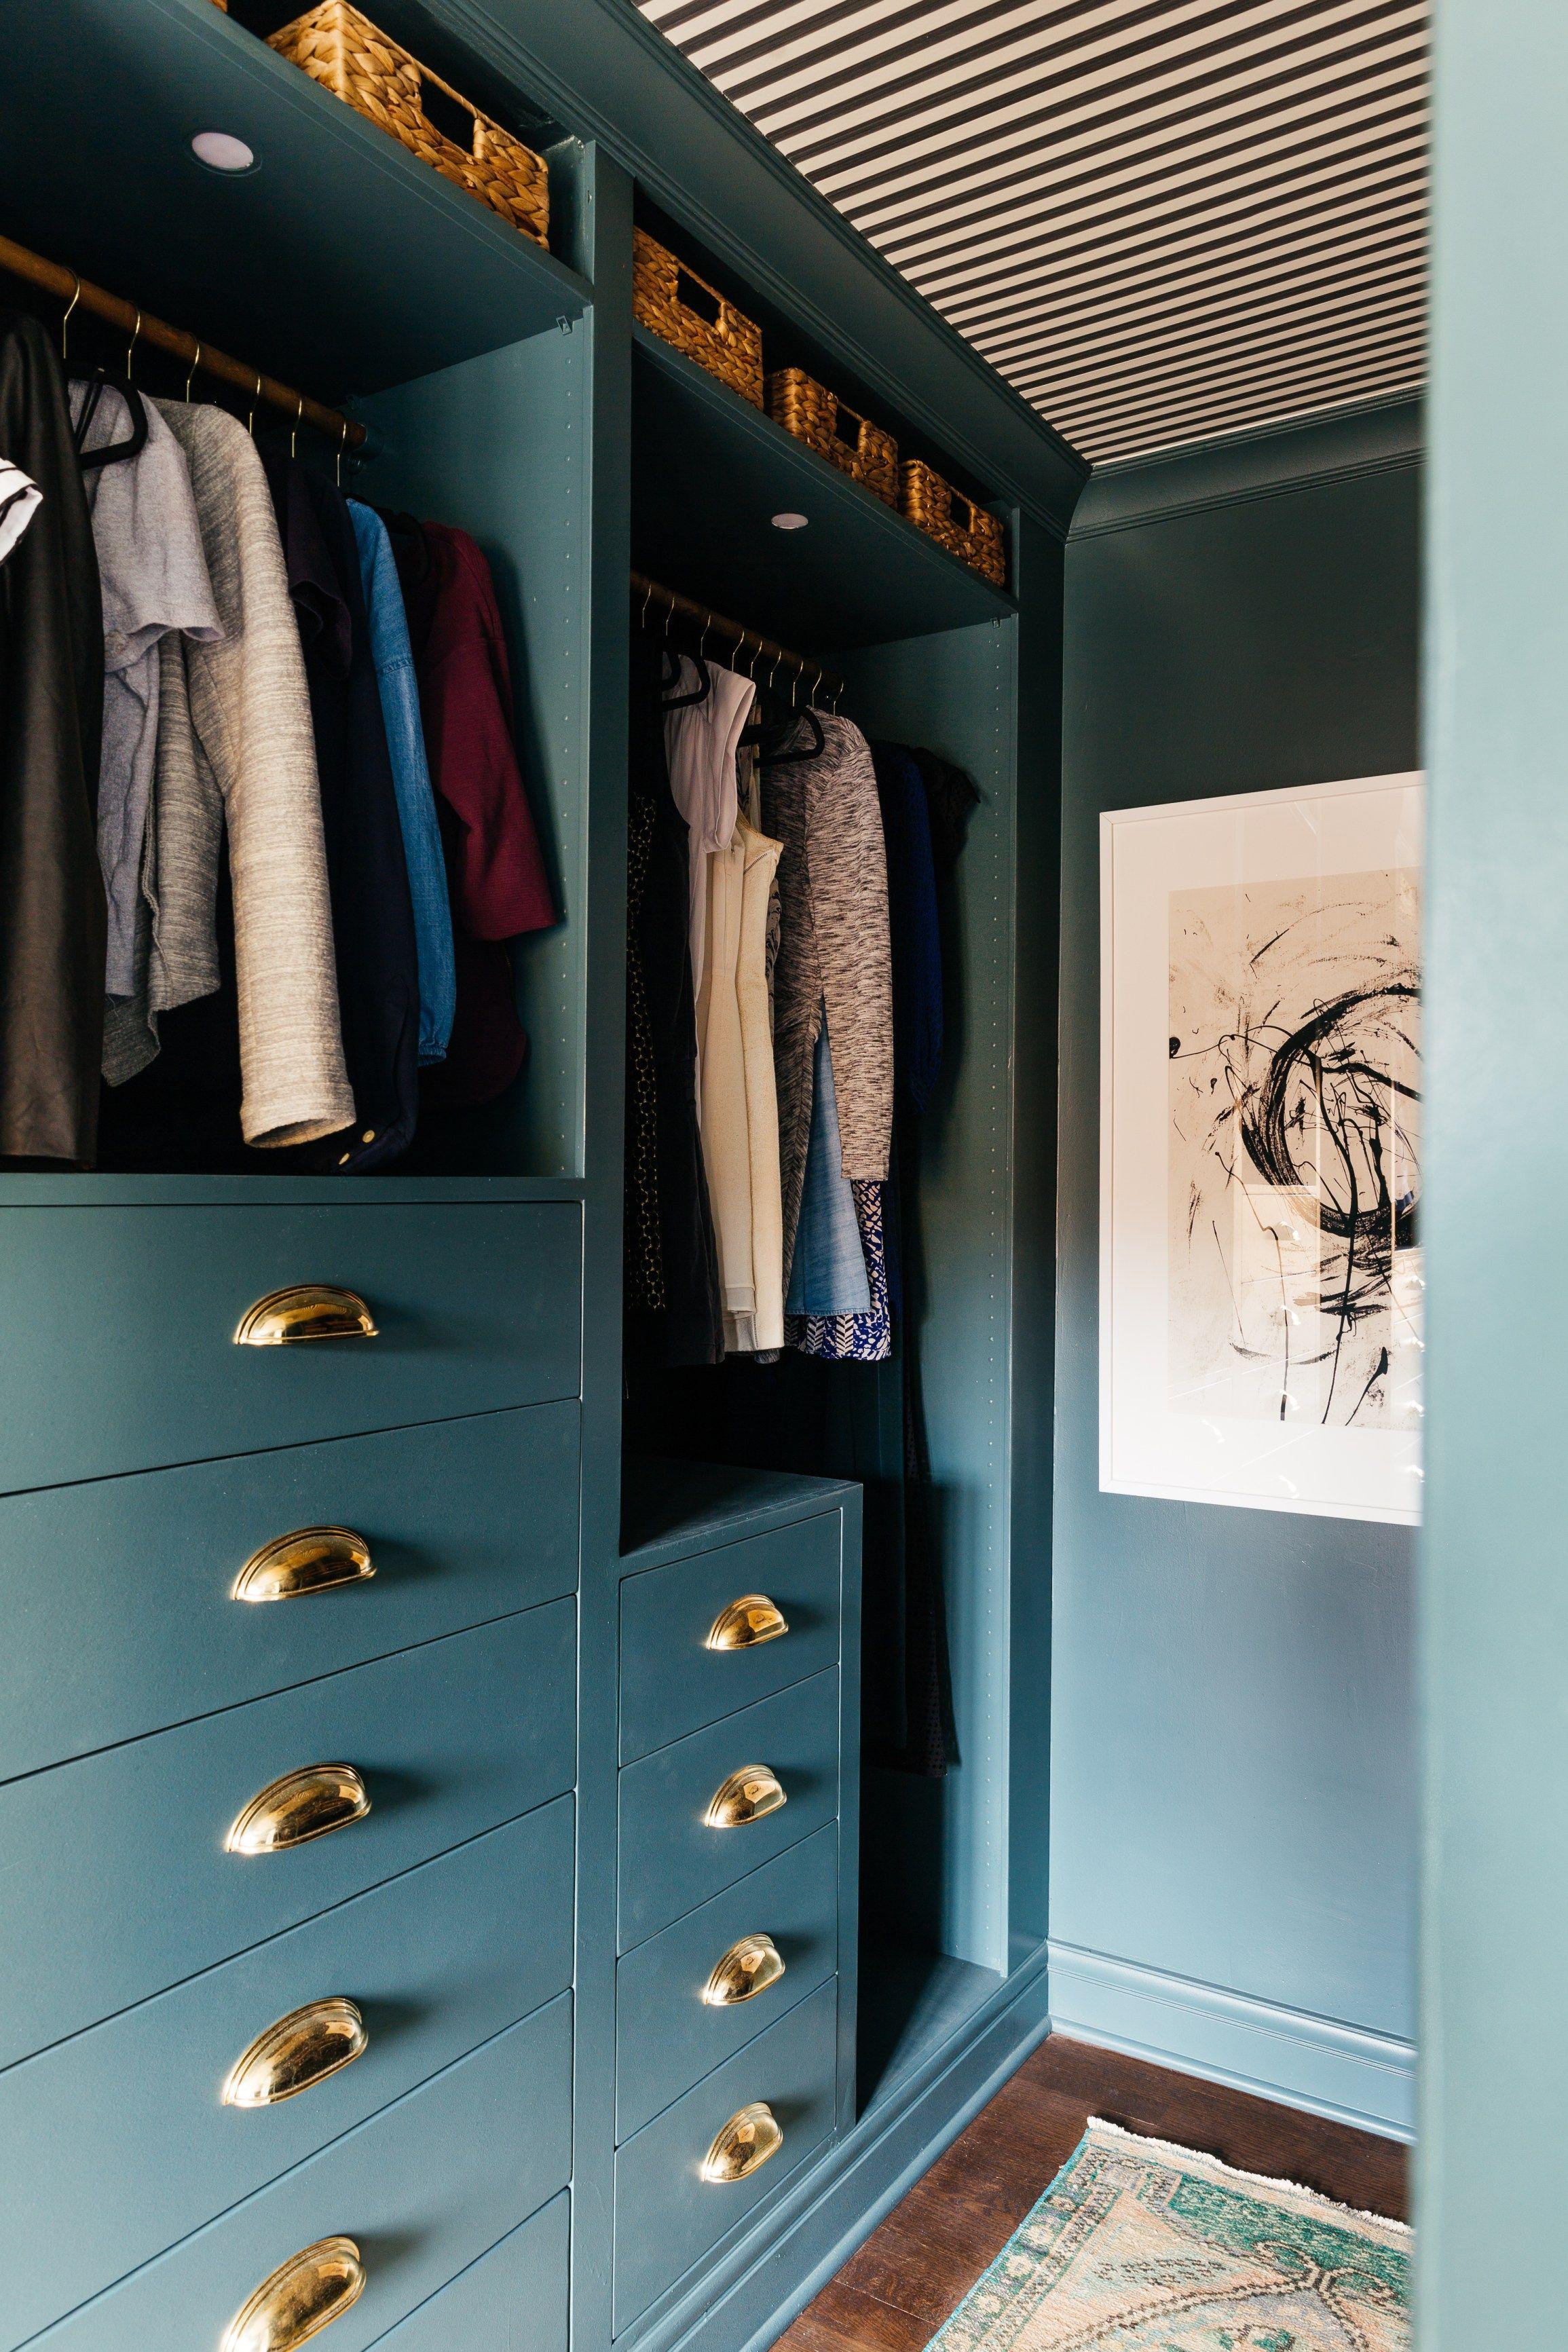 Hacking the IKEA Pax into a Fully Custom Closet